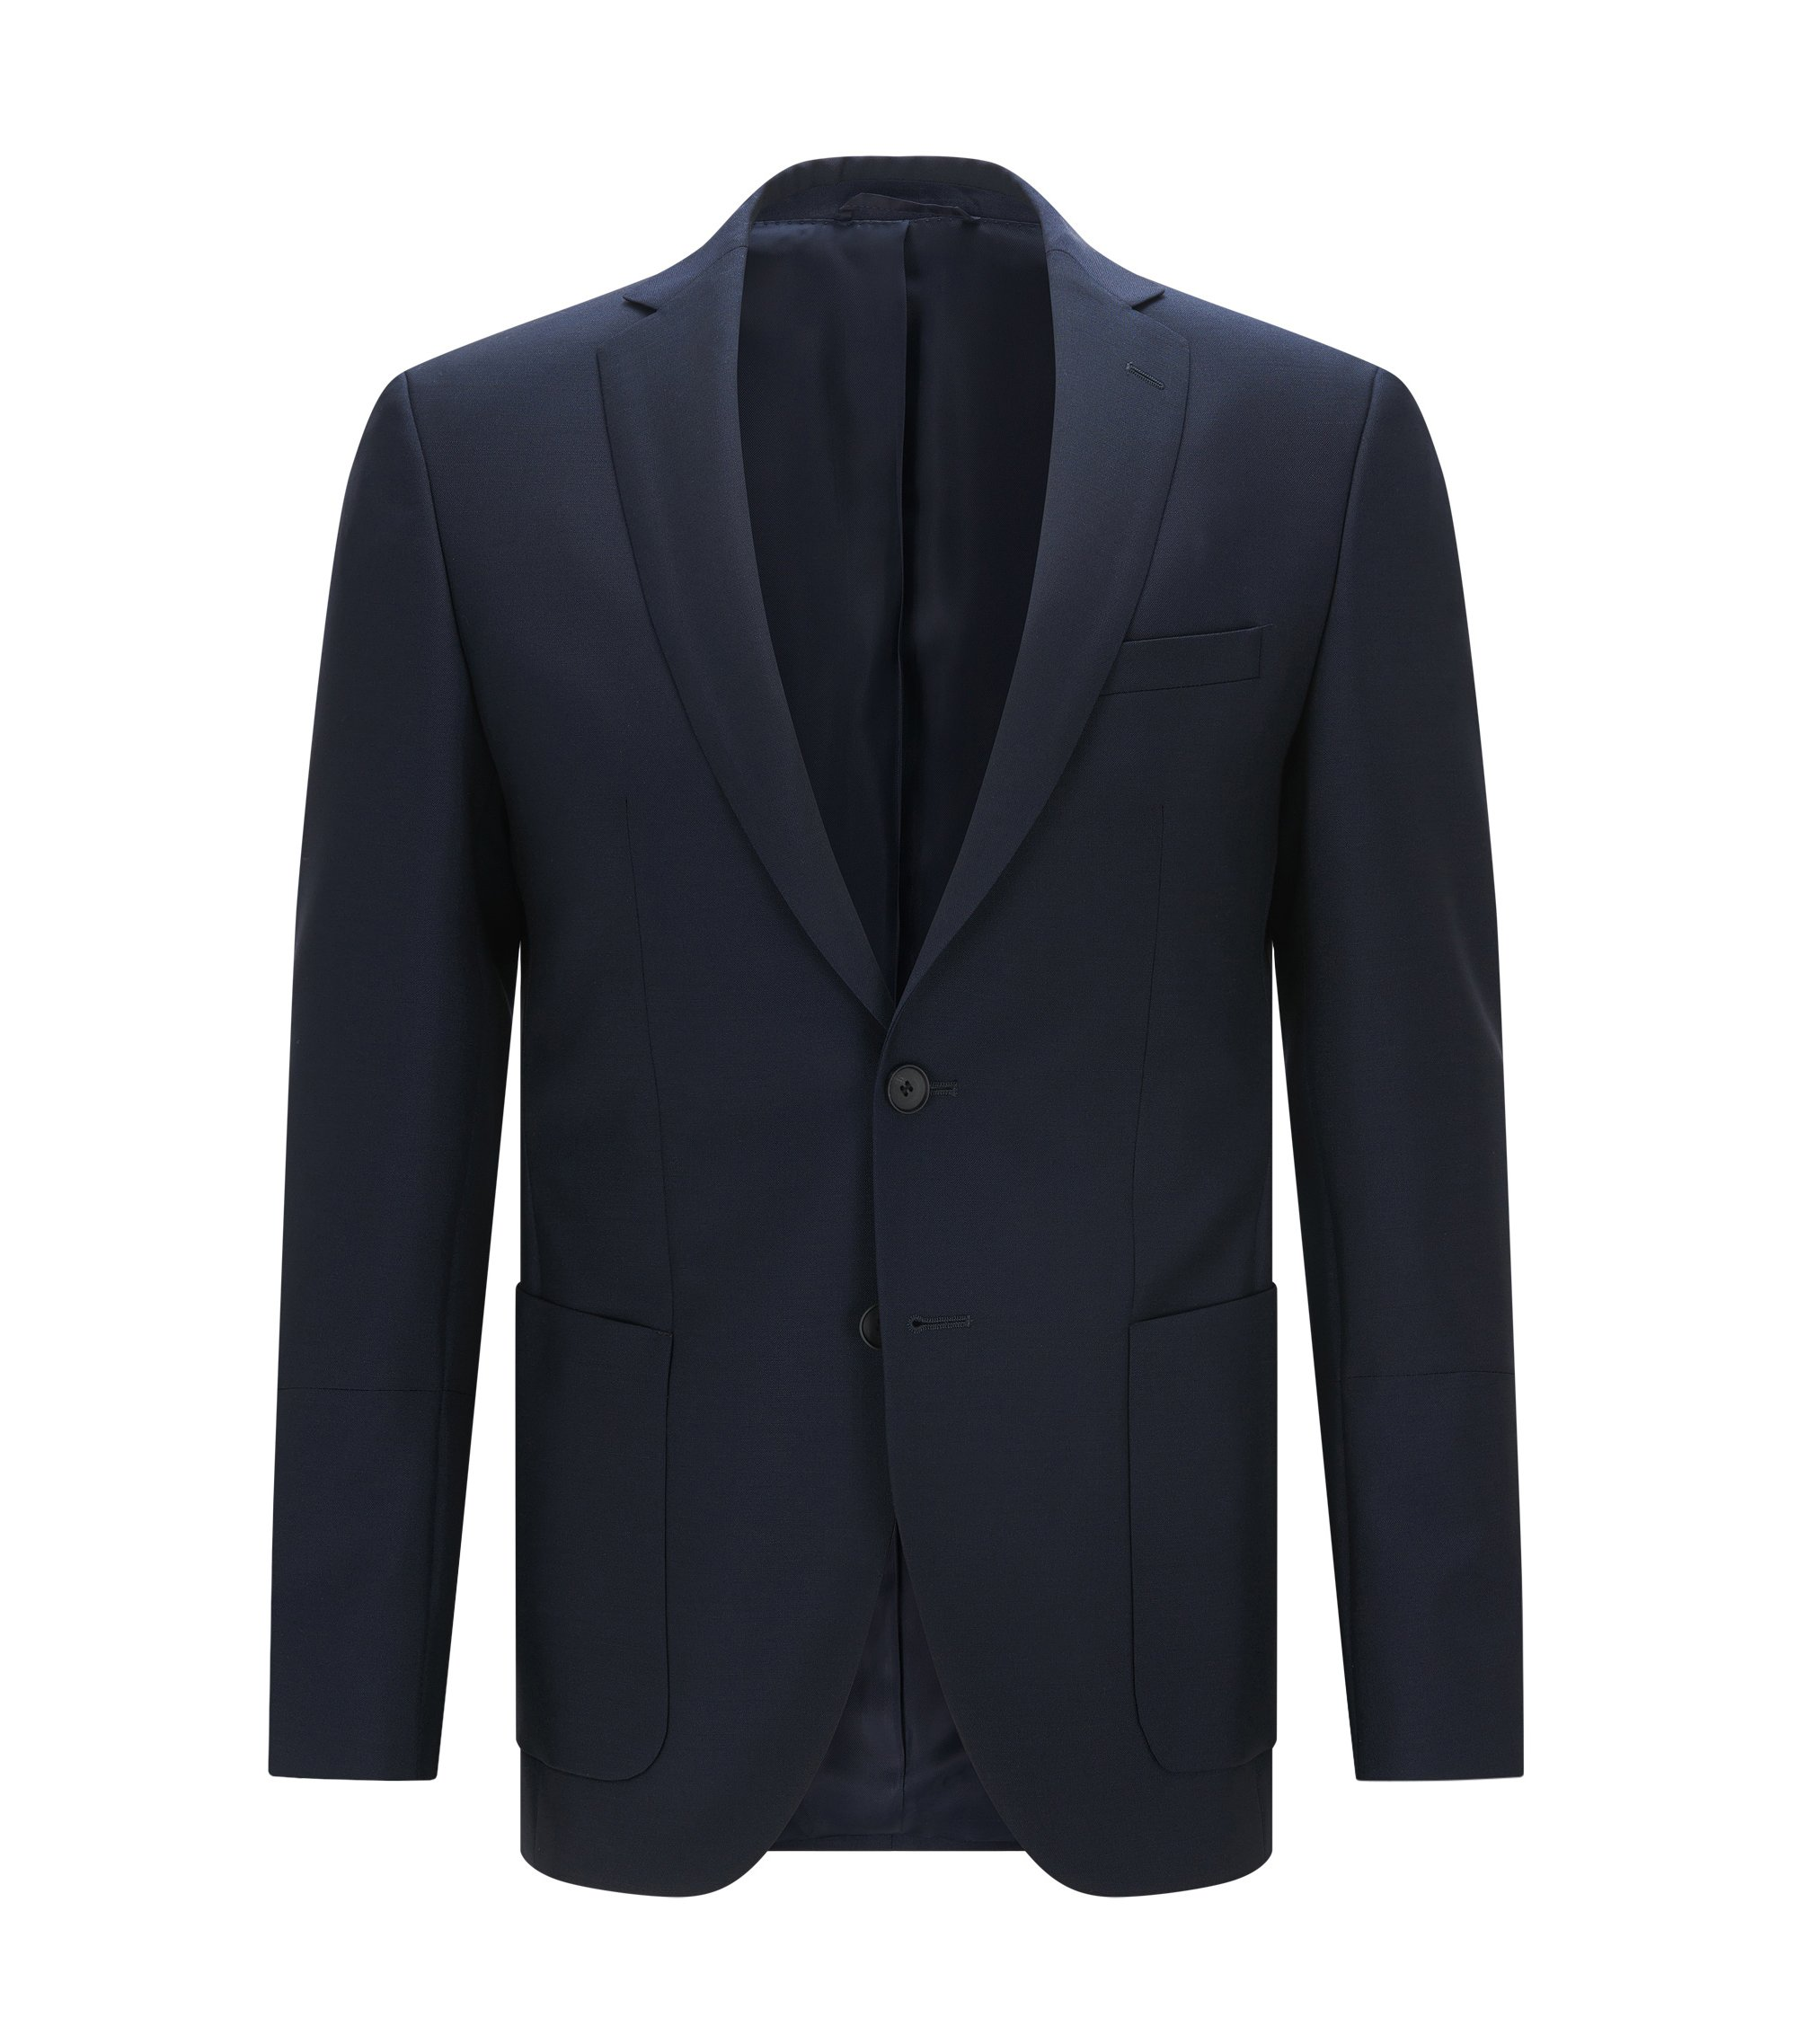 Virgin Mohair Sport Coat, Extra Slim Fit   Rodwil, Dark Blue